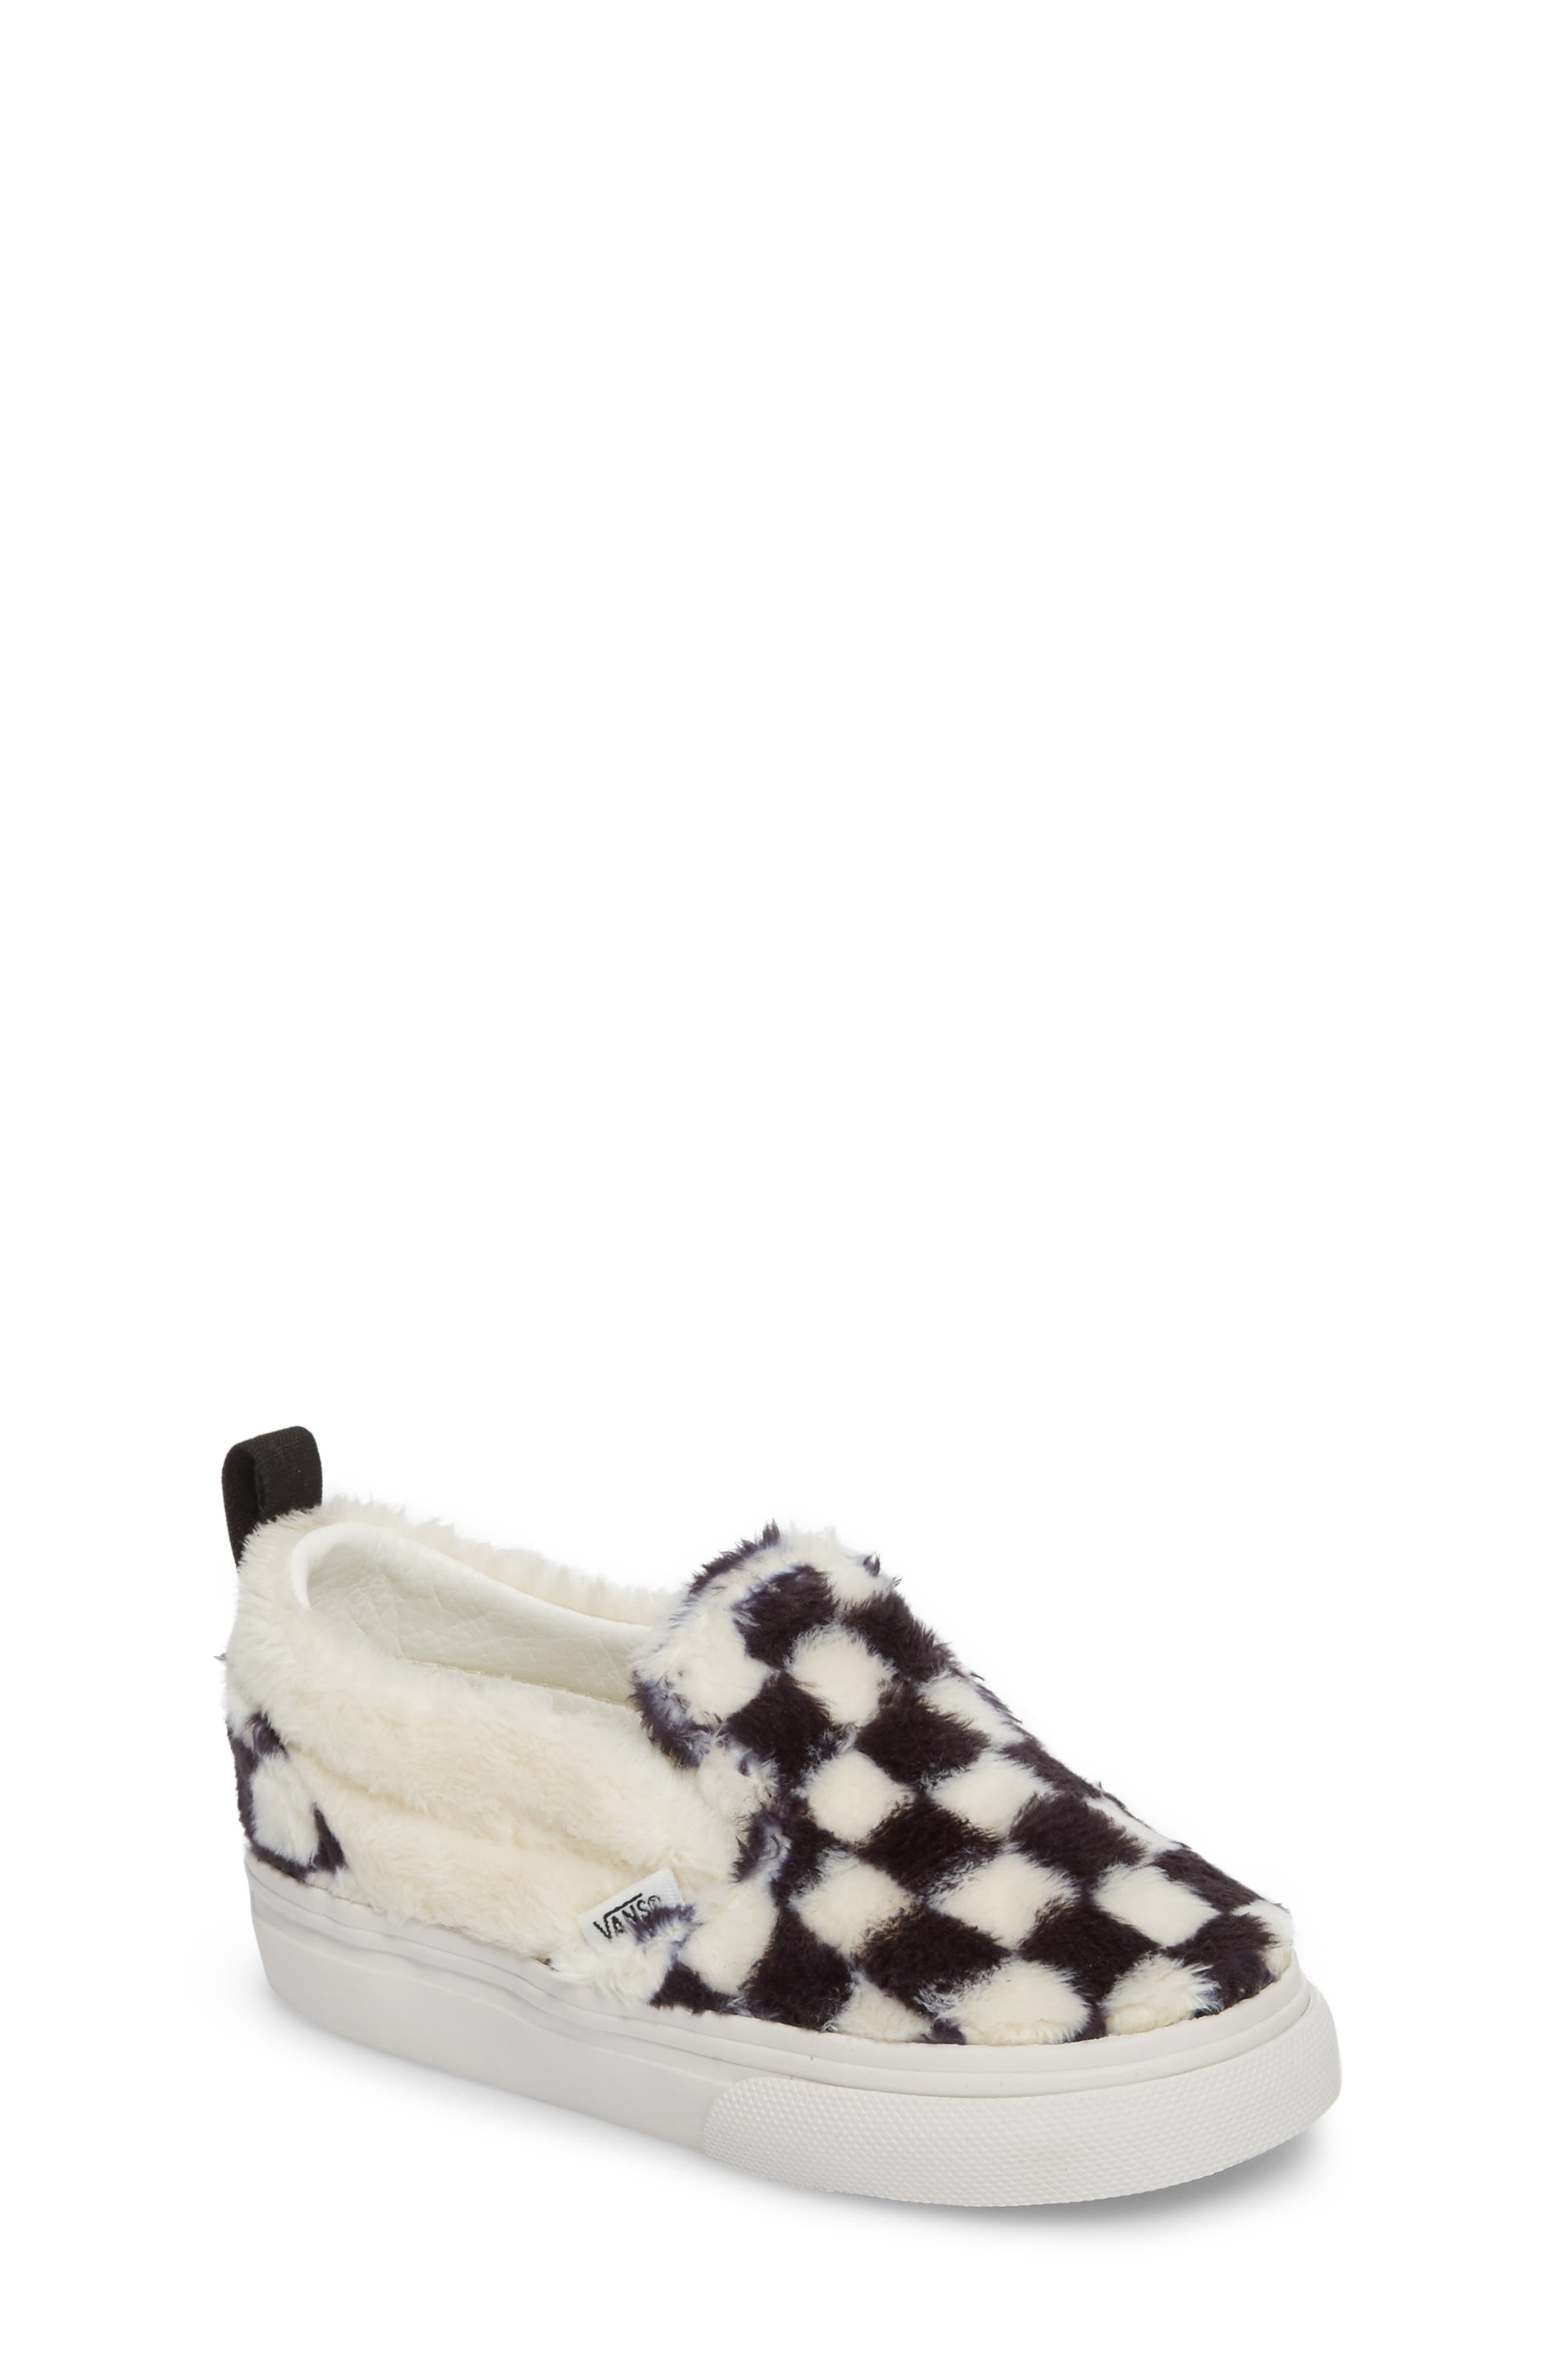 Faux Fur Slip-On Sneaker,                         Main,                         color, Black/ White Sherpa Check